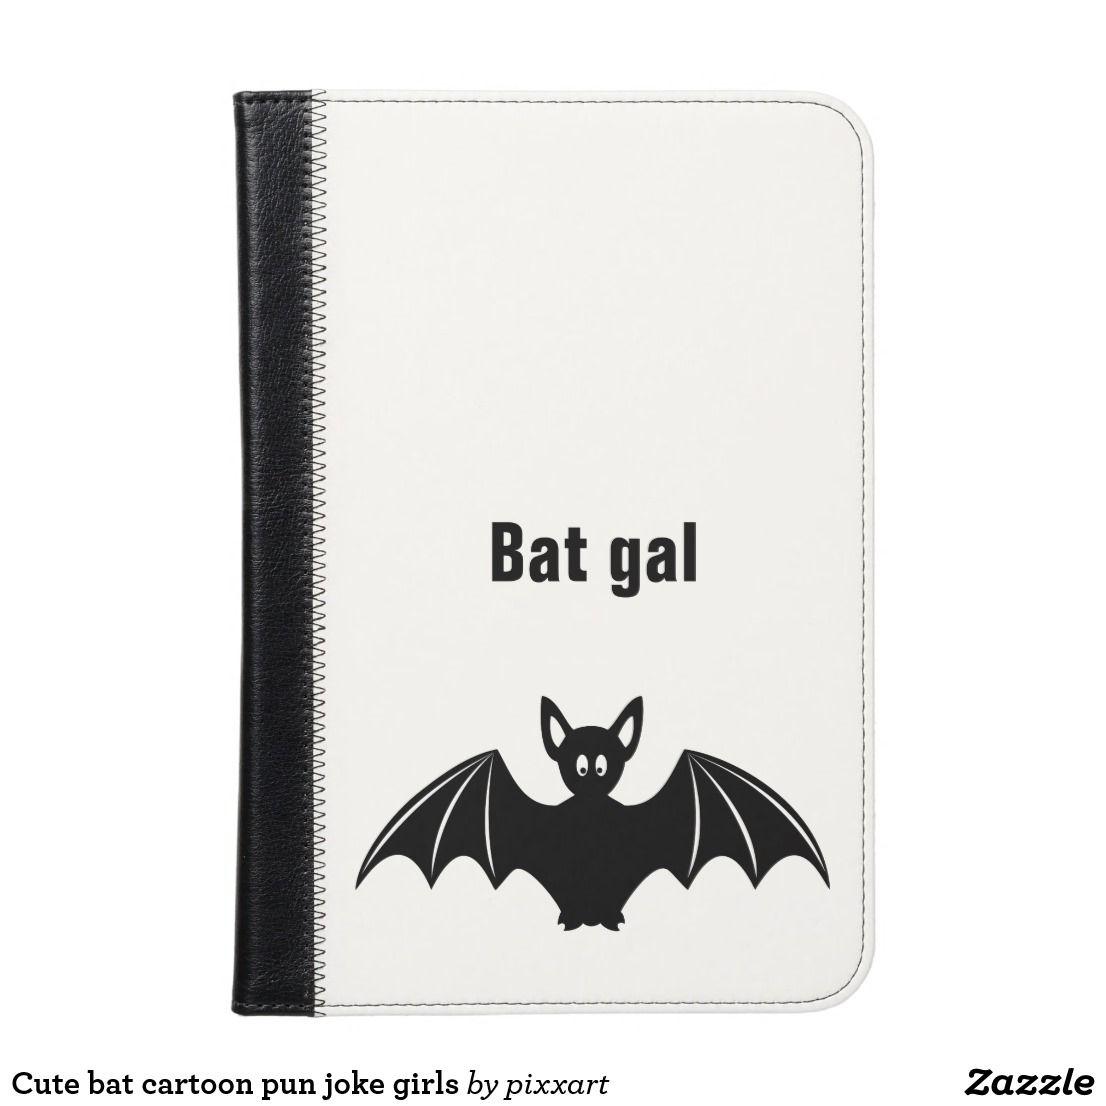 Cute Bat Cartoon Pun Joke Girls Ipad Mini Case Zazzle Com